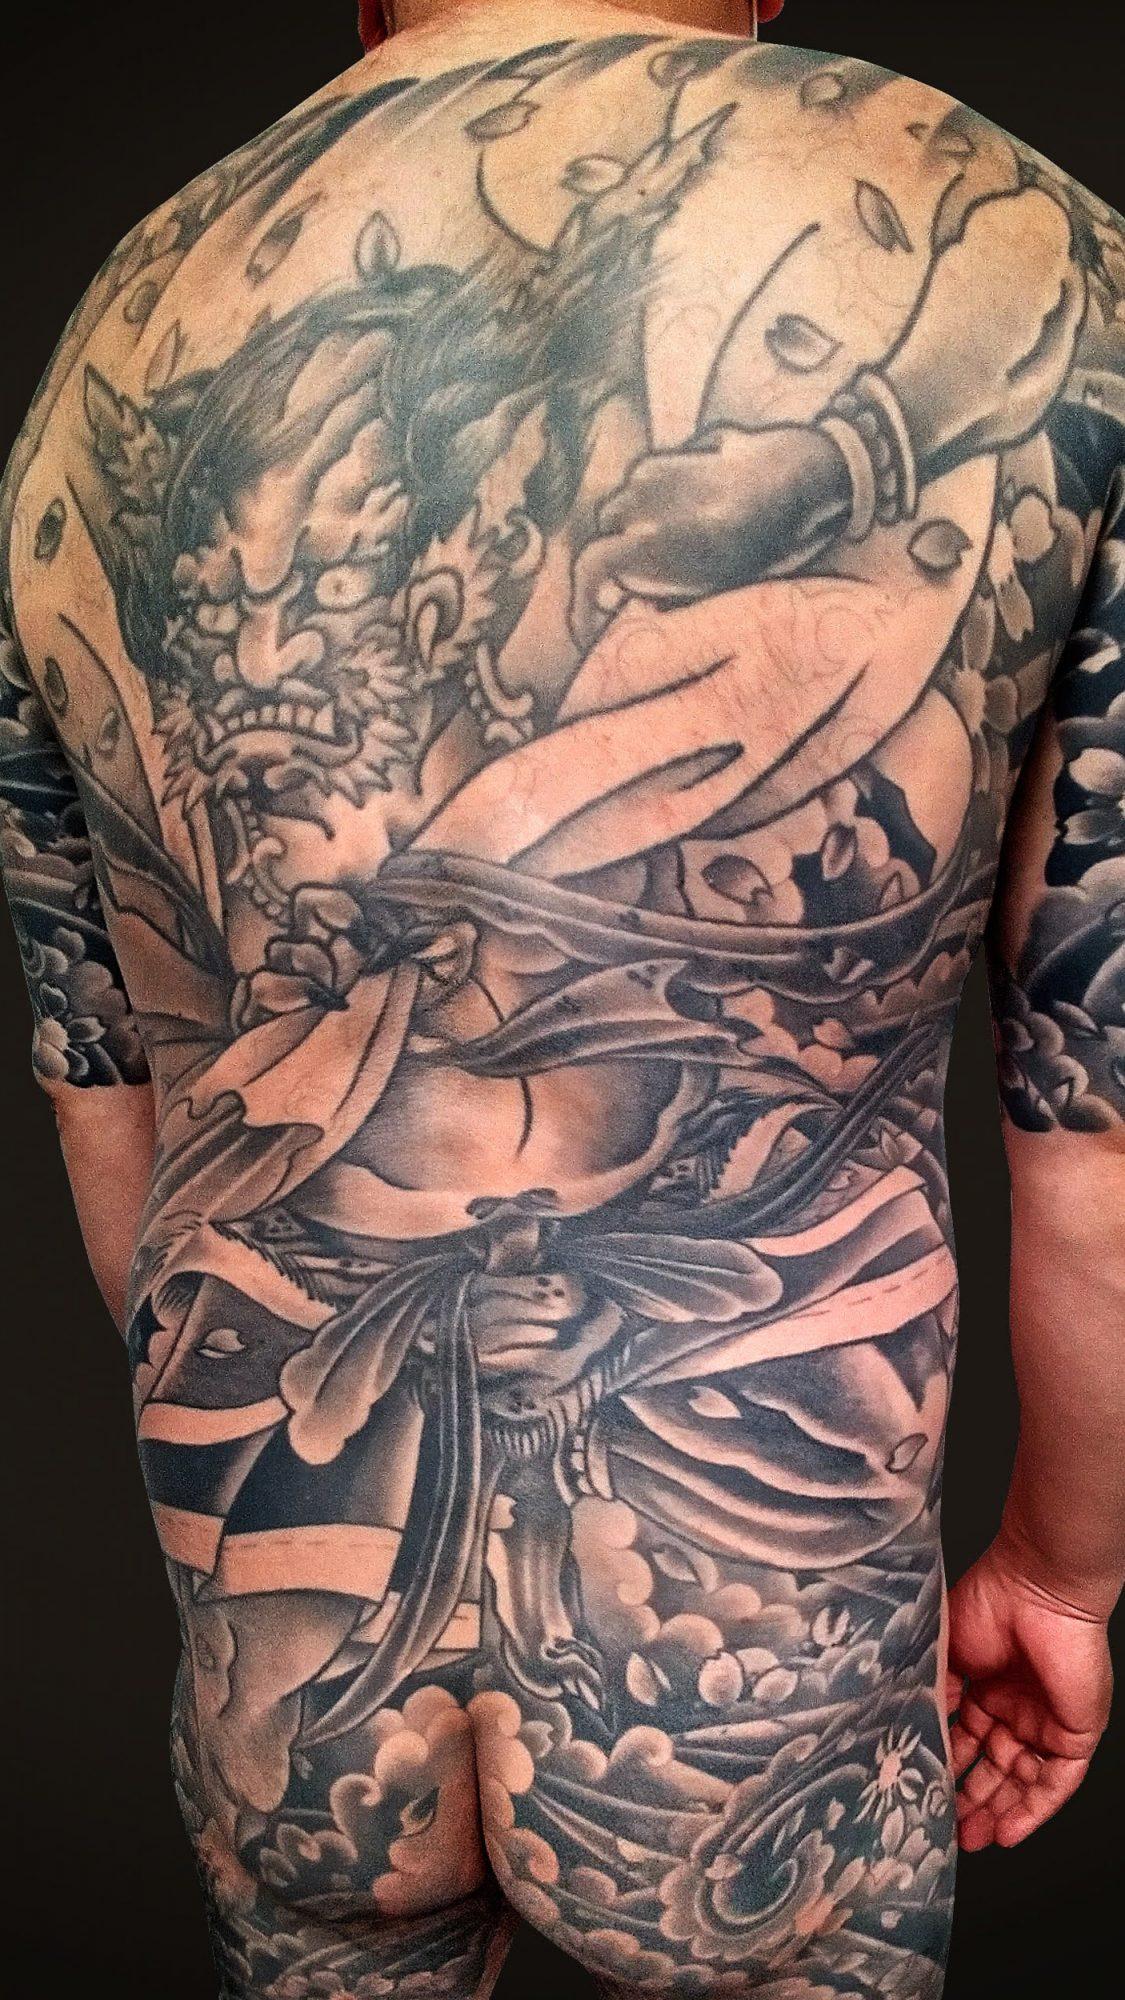 KINGRAT TATTOO 作品 | LAVA gallery | Tattoo artist: Yuji Anai | キングラット | ラバギャラリー | タトゥーアート | 福岡県北九州市 | 20210718_05b